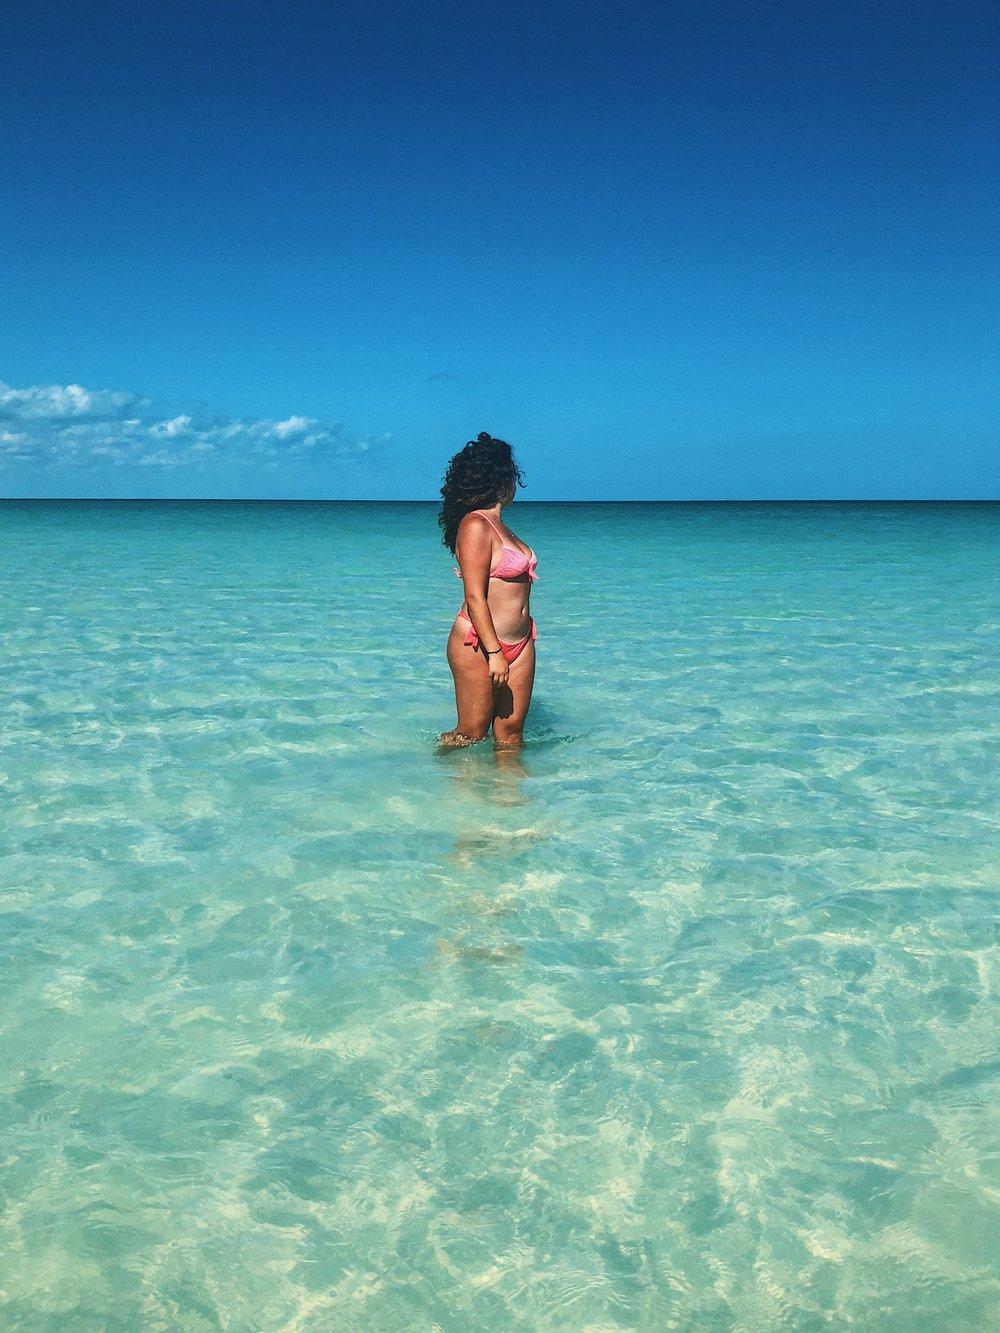 islaholbox_ambarjanuel_mexico_beachtravels_nomadinislaholbox_nomadtravel_digitalnomad